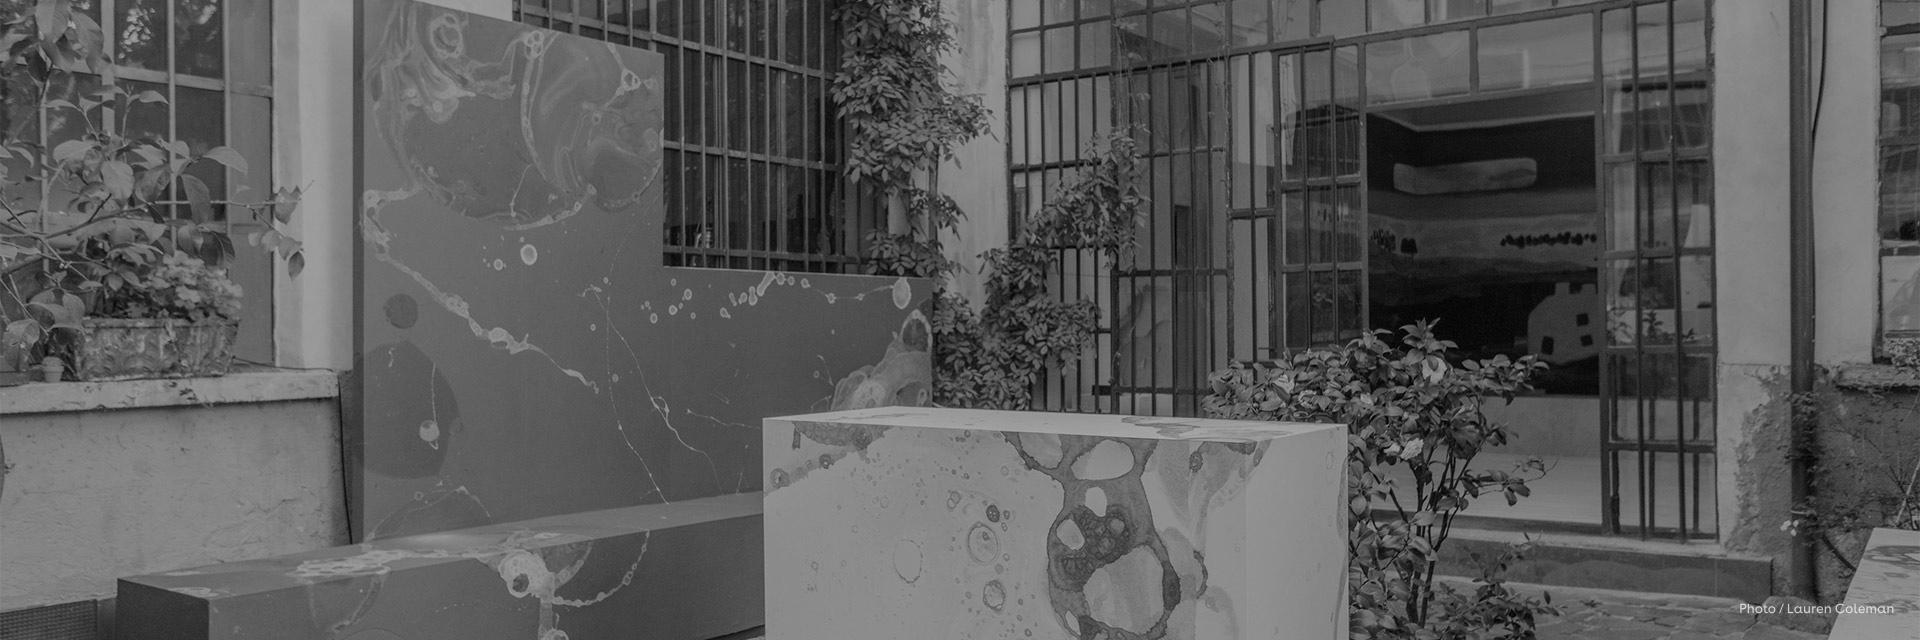 BCXSY,成立于2007年的荷兰知名设计工作室,是以色列设计师Boaz Cohen和日本Sayaka Yamamoto之间的跨学科合作。设计师拥有东西方两种独特的文化背景,擅长以独特的叙事手法,将东西方文化融合,通过概念传递、身份塑造,图案绘制以及氛围营造等手段,用戏剧化的方式,呈现纯粹而带有情感的作品。在过去几年中,BCXSY因其设计项目对社会的影响而赢得了国际的赞誉,作品也在国际众多负有盛名的设计展中亮相,并被伦敦维多利亚和阿尔伯特博物馆、香港M+博物馆等永久收藏。